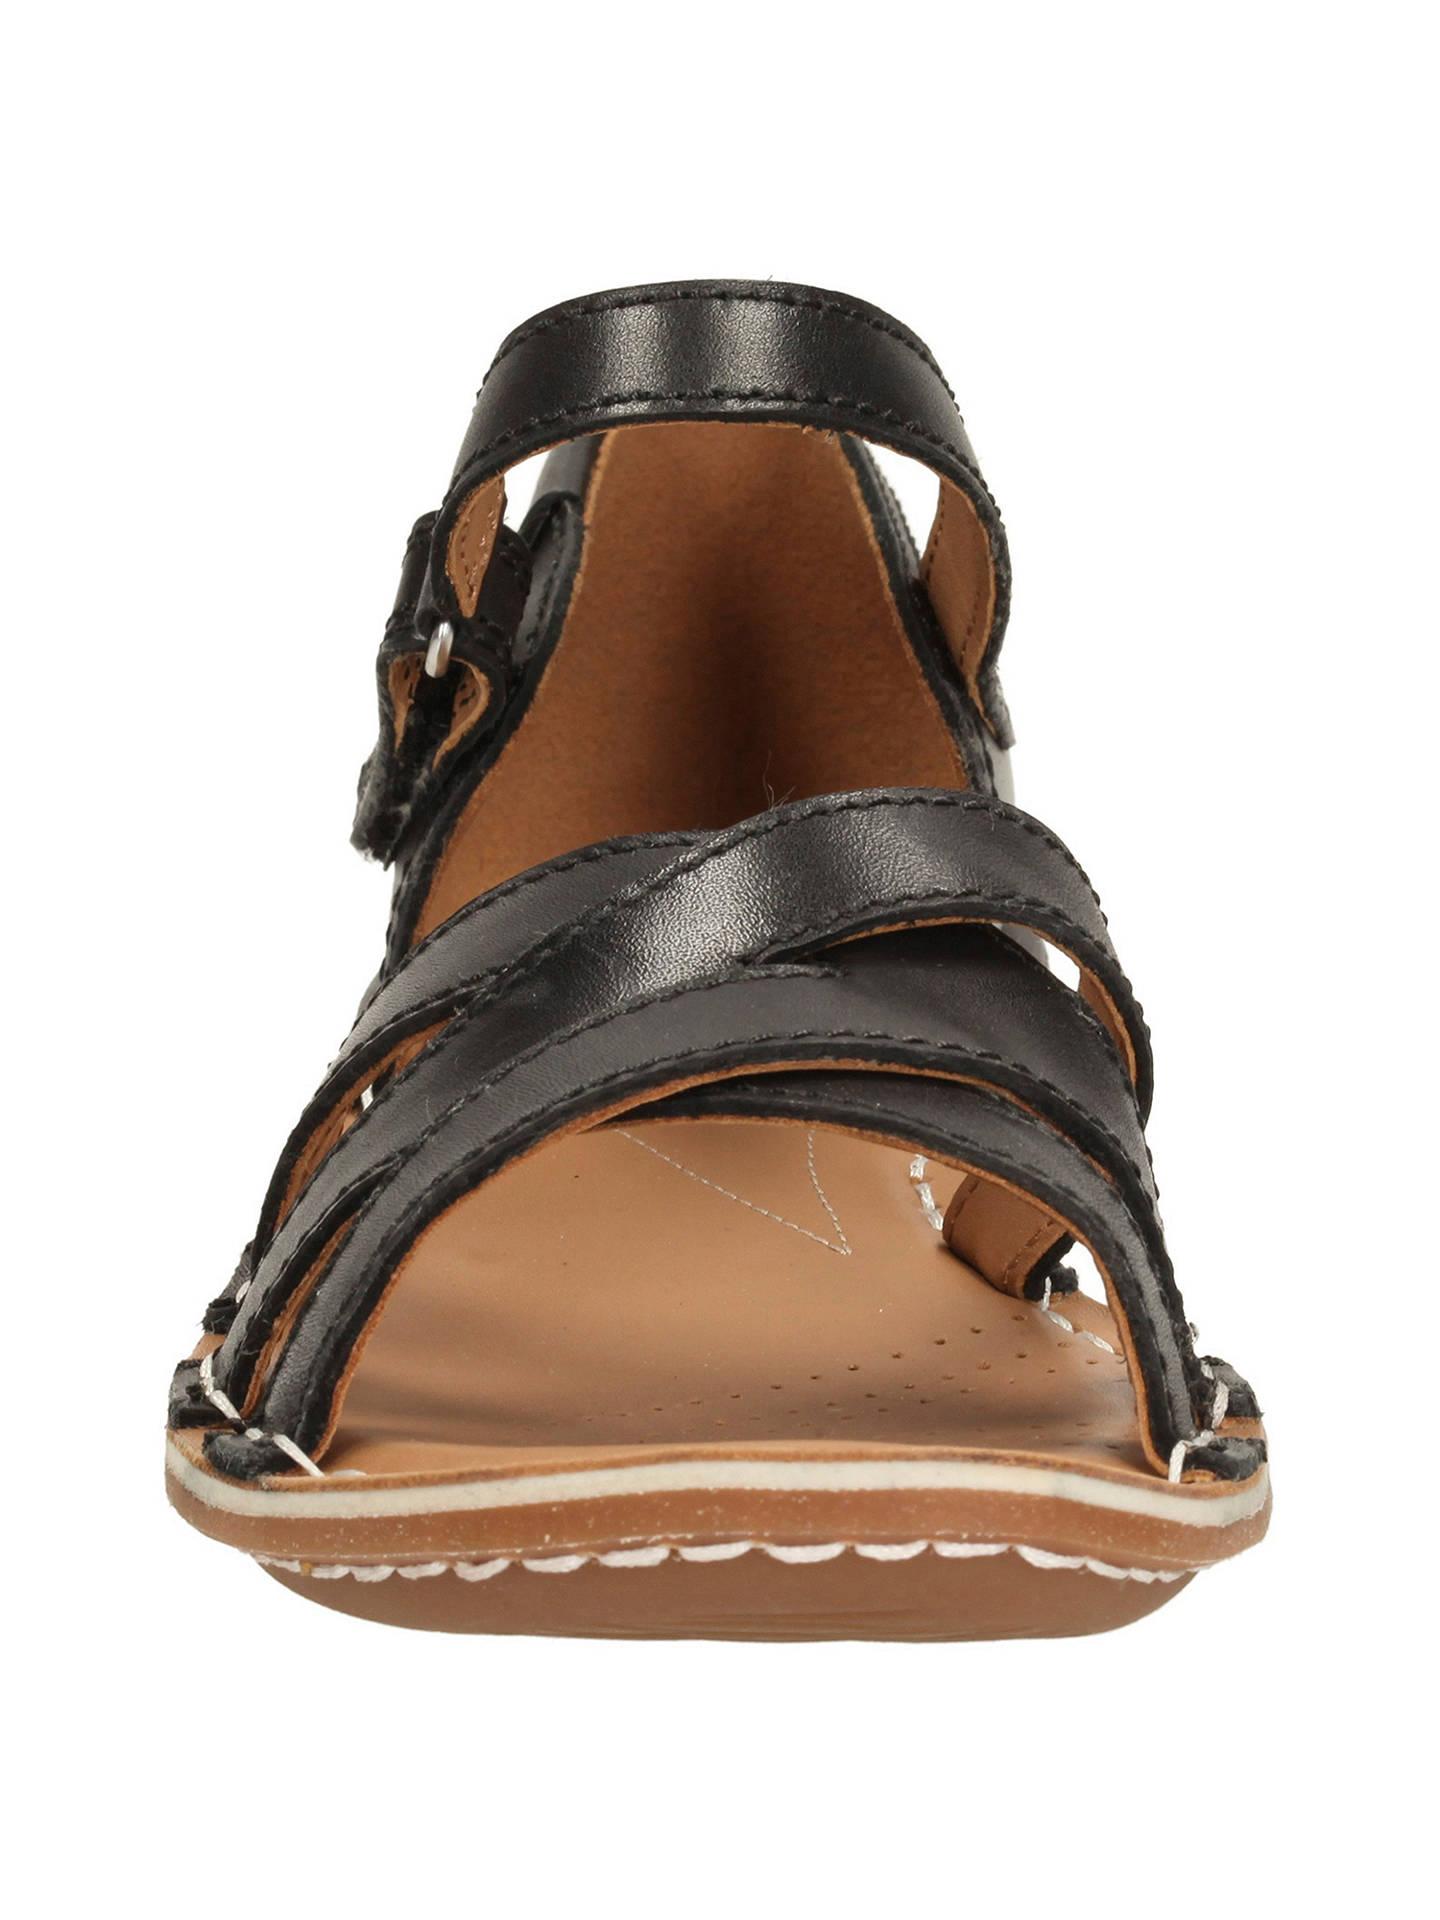 b7bc1ed09e446 Clarks Tustin Sahara Leather Sandals at John Lewis   Partners